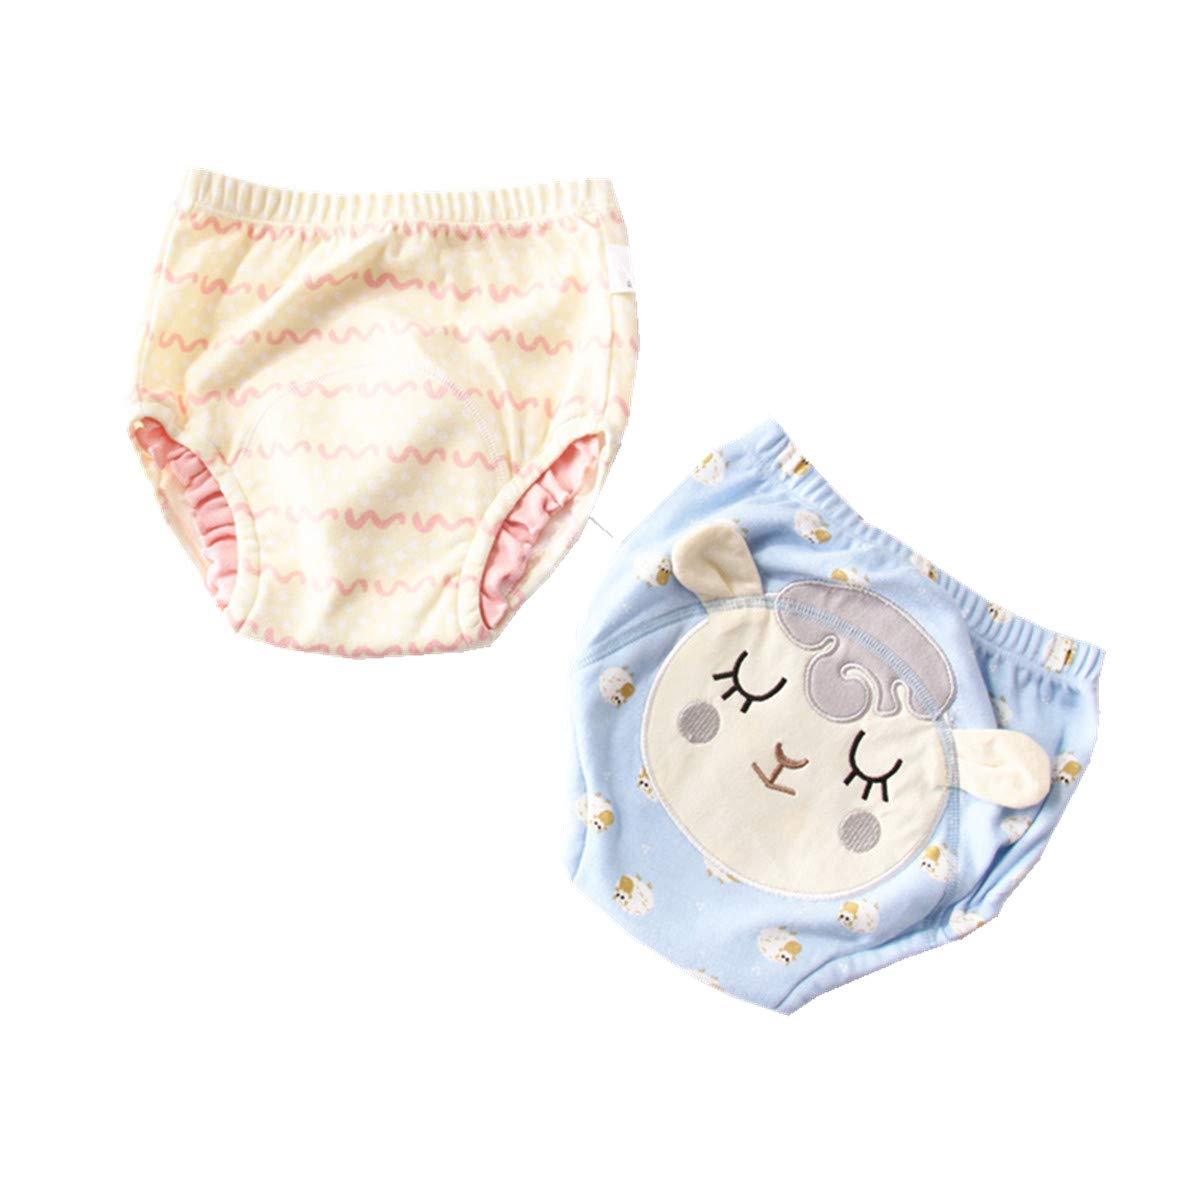 WINZIK 2Pcs Baby Boy Girl Cartoon Potty Training Pants Washable Reusable Toddler Cotton Toilet Nappy Underwear for 12M-3Y